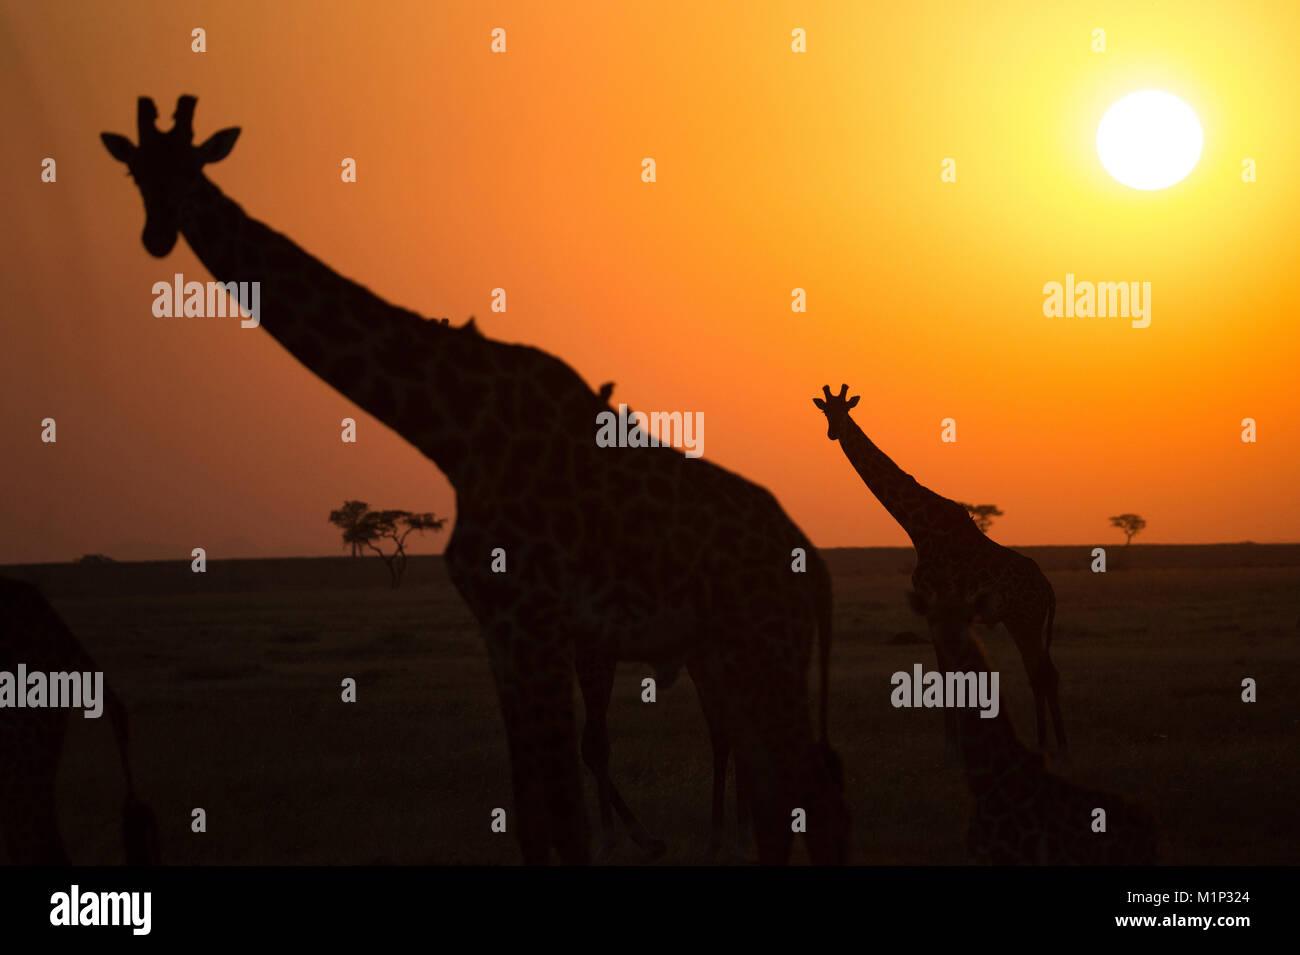 Silhouettes de Girafe (Giraffa camelopardalis) au coucher du soleil, le Parc National du Serengeti, Tanzanie, Afrique Photo Stock